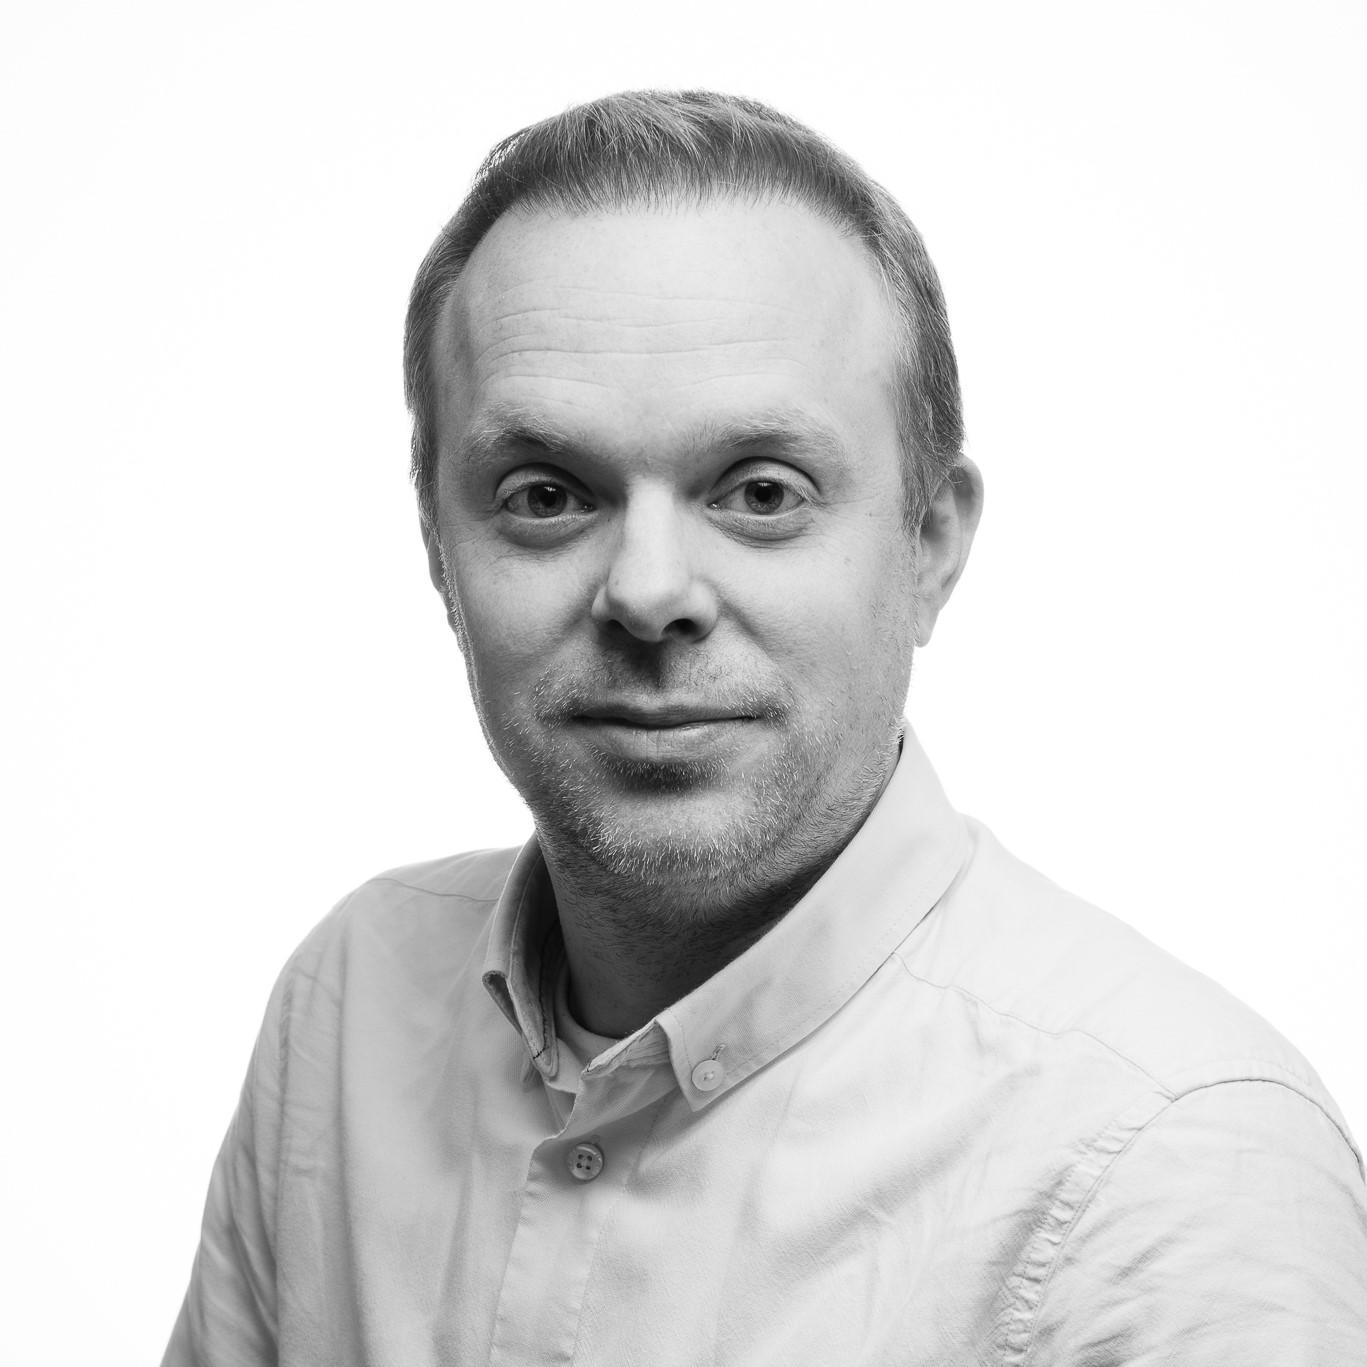 Christian - Svartvit profil